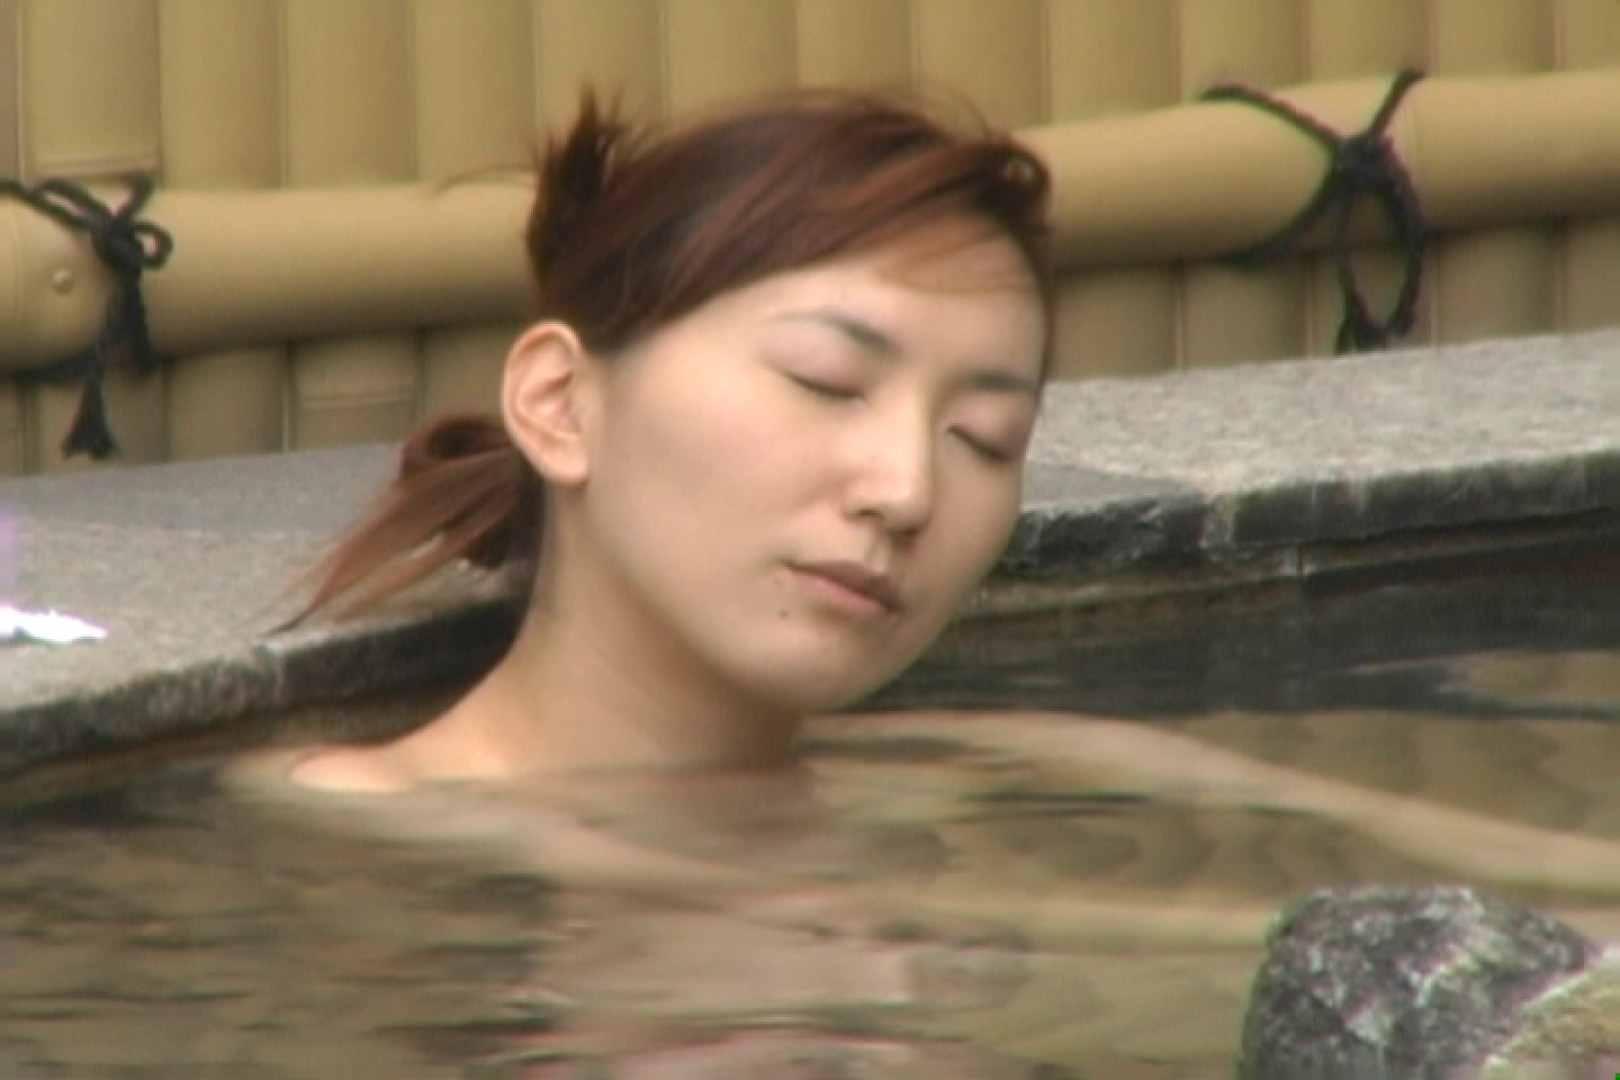 Aquaな露天風呂Vol.616 露天   OLセックス  99画像 40